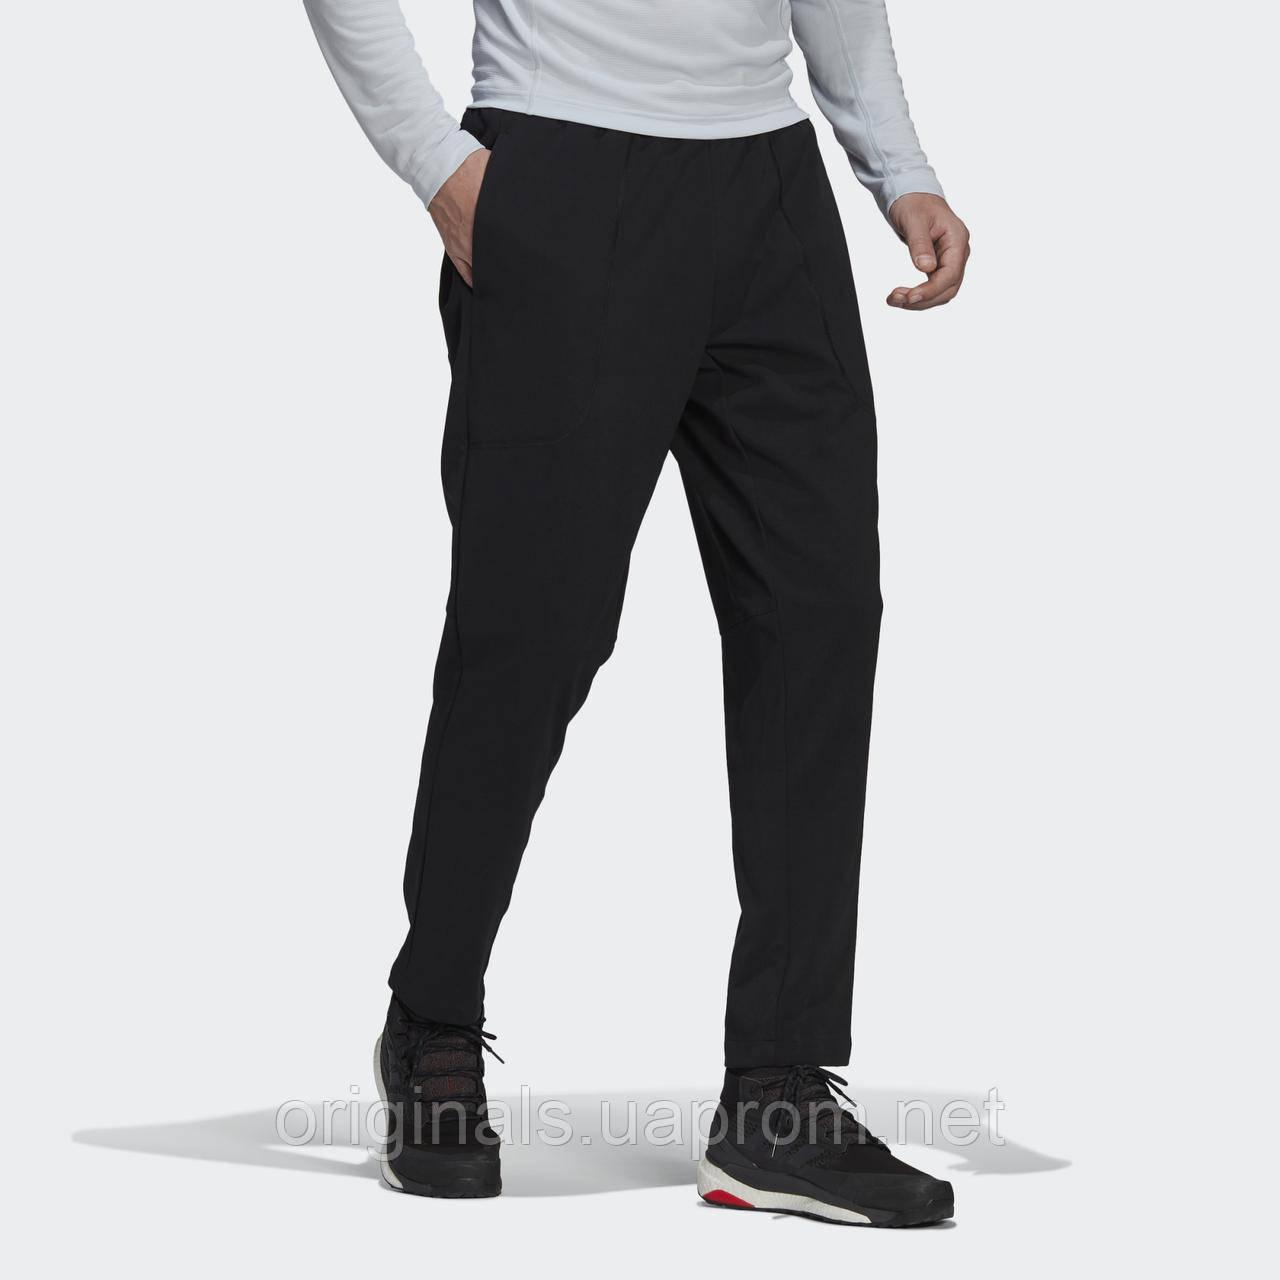 Мужские брюки Adidas Terrex Multi Primegreen GM4771 2021